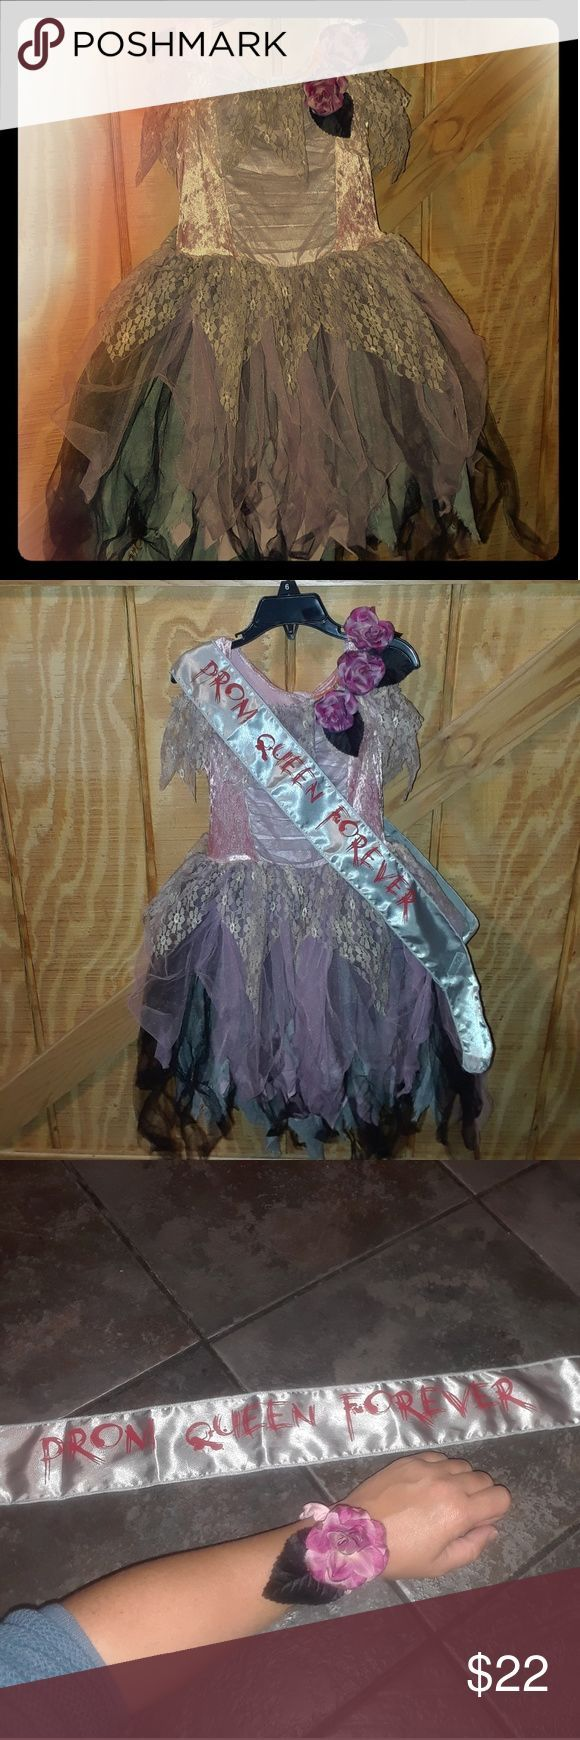 Verkaufe dieses Kleid Halloween Girls 6 Halloween Kostüm Dead Prom Queen in Pos…